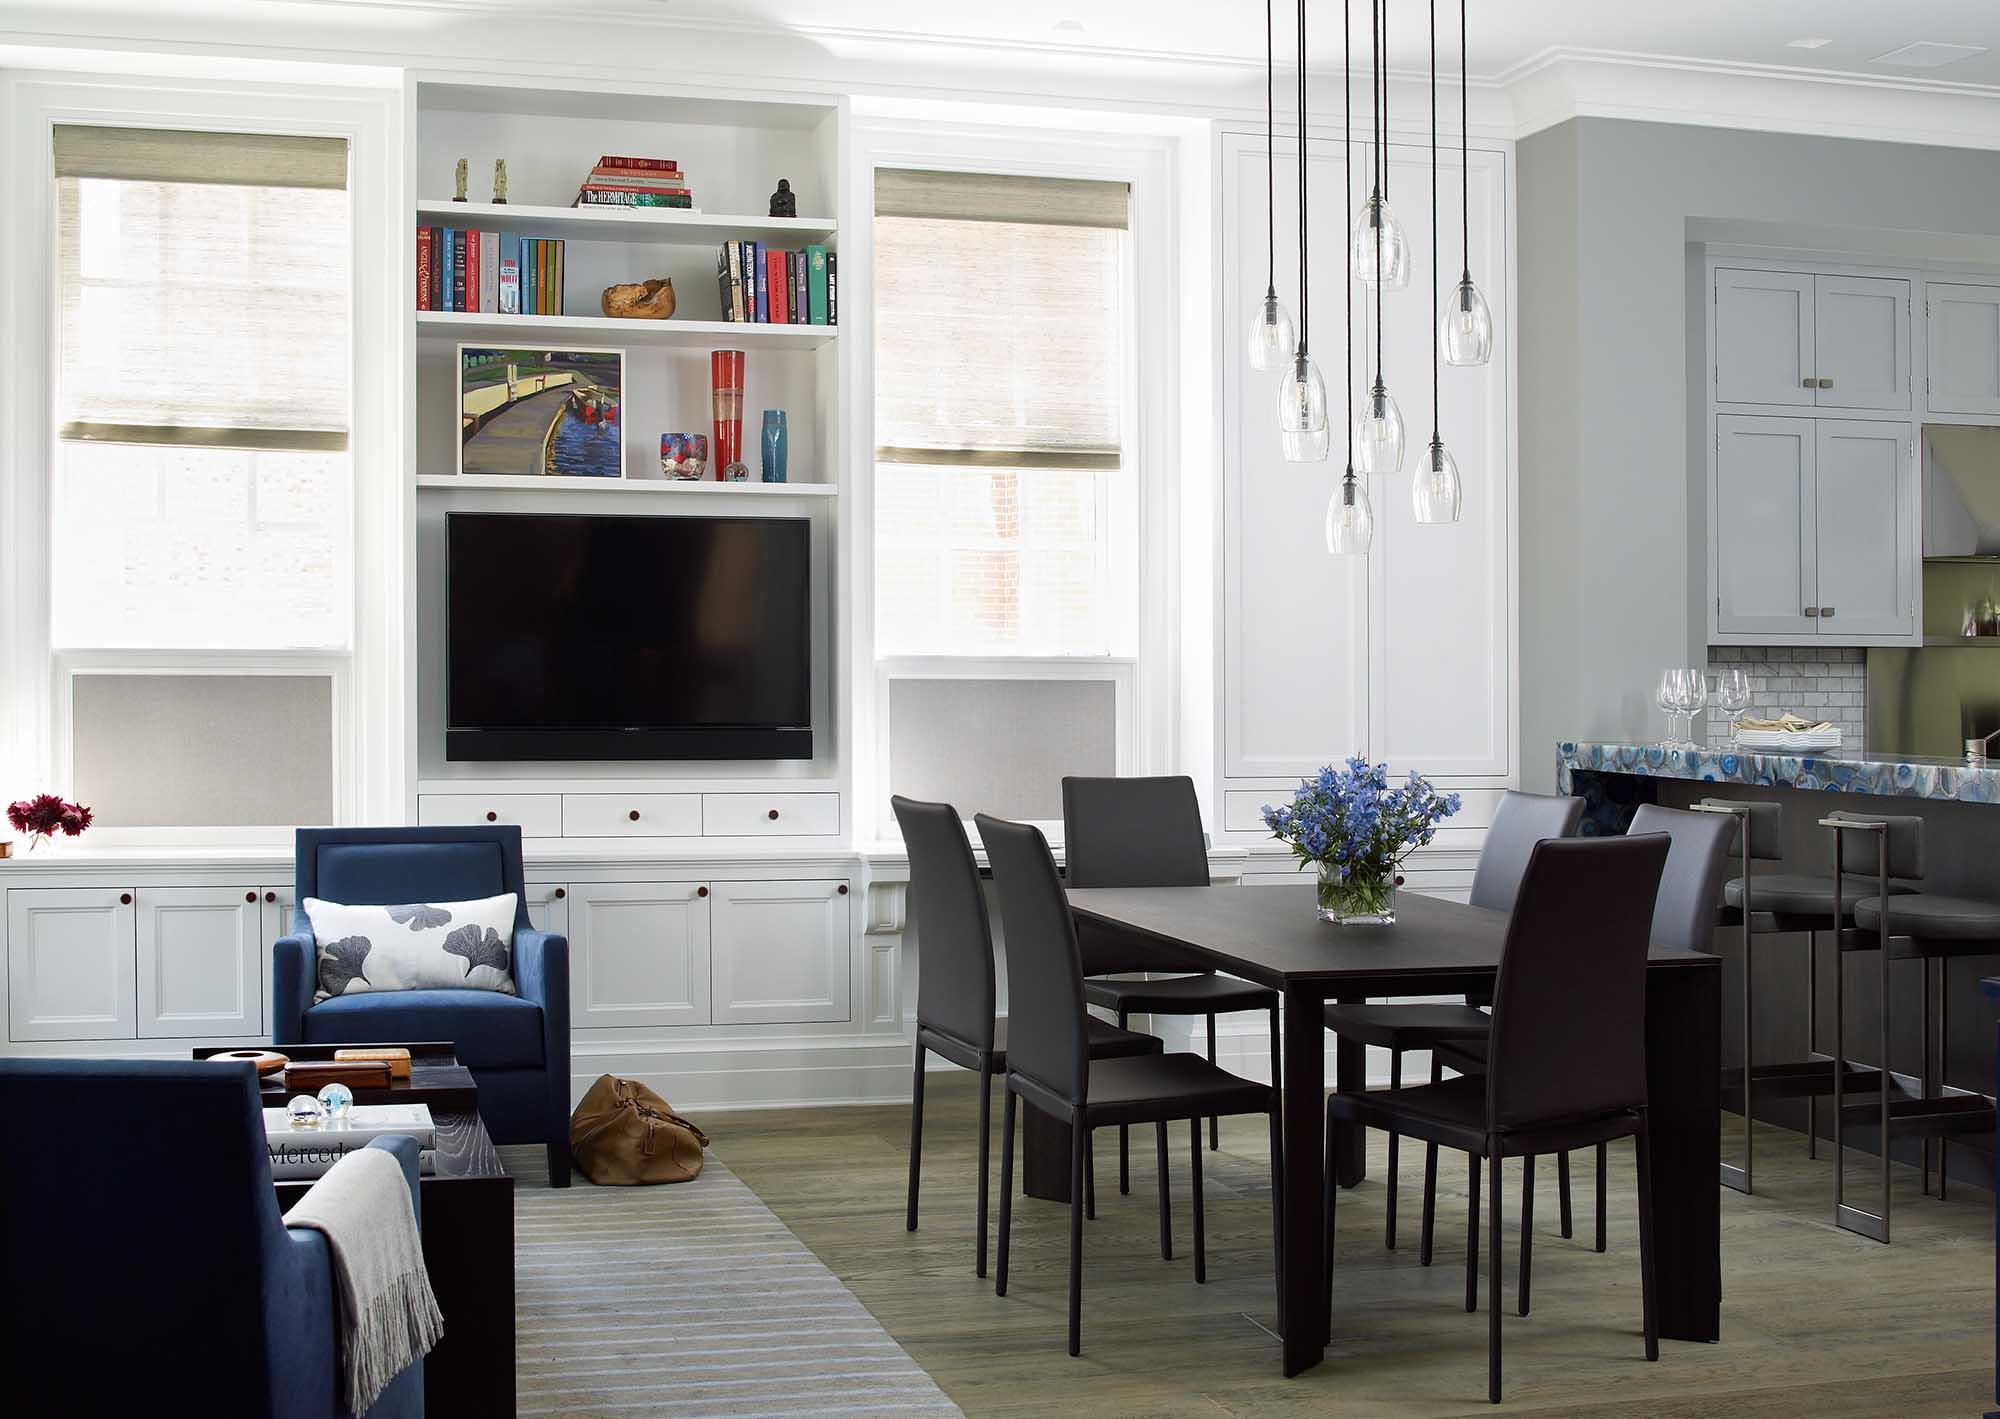 79th Street Apartment, Lenox Hill, Manhattan, Central Park transitional, breakfast family kitchen, built in